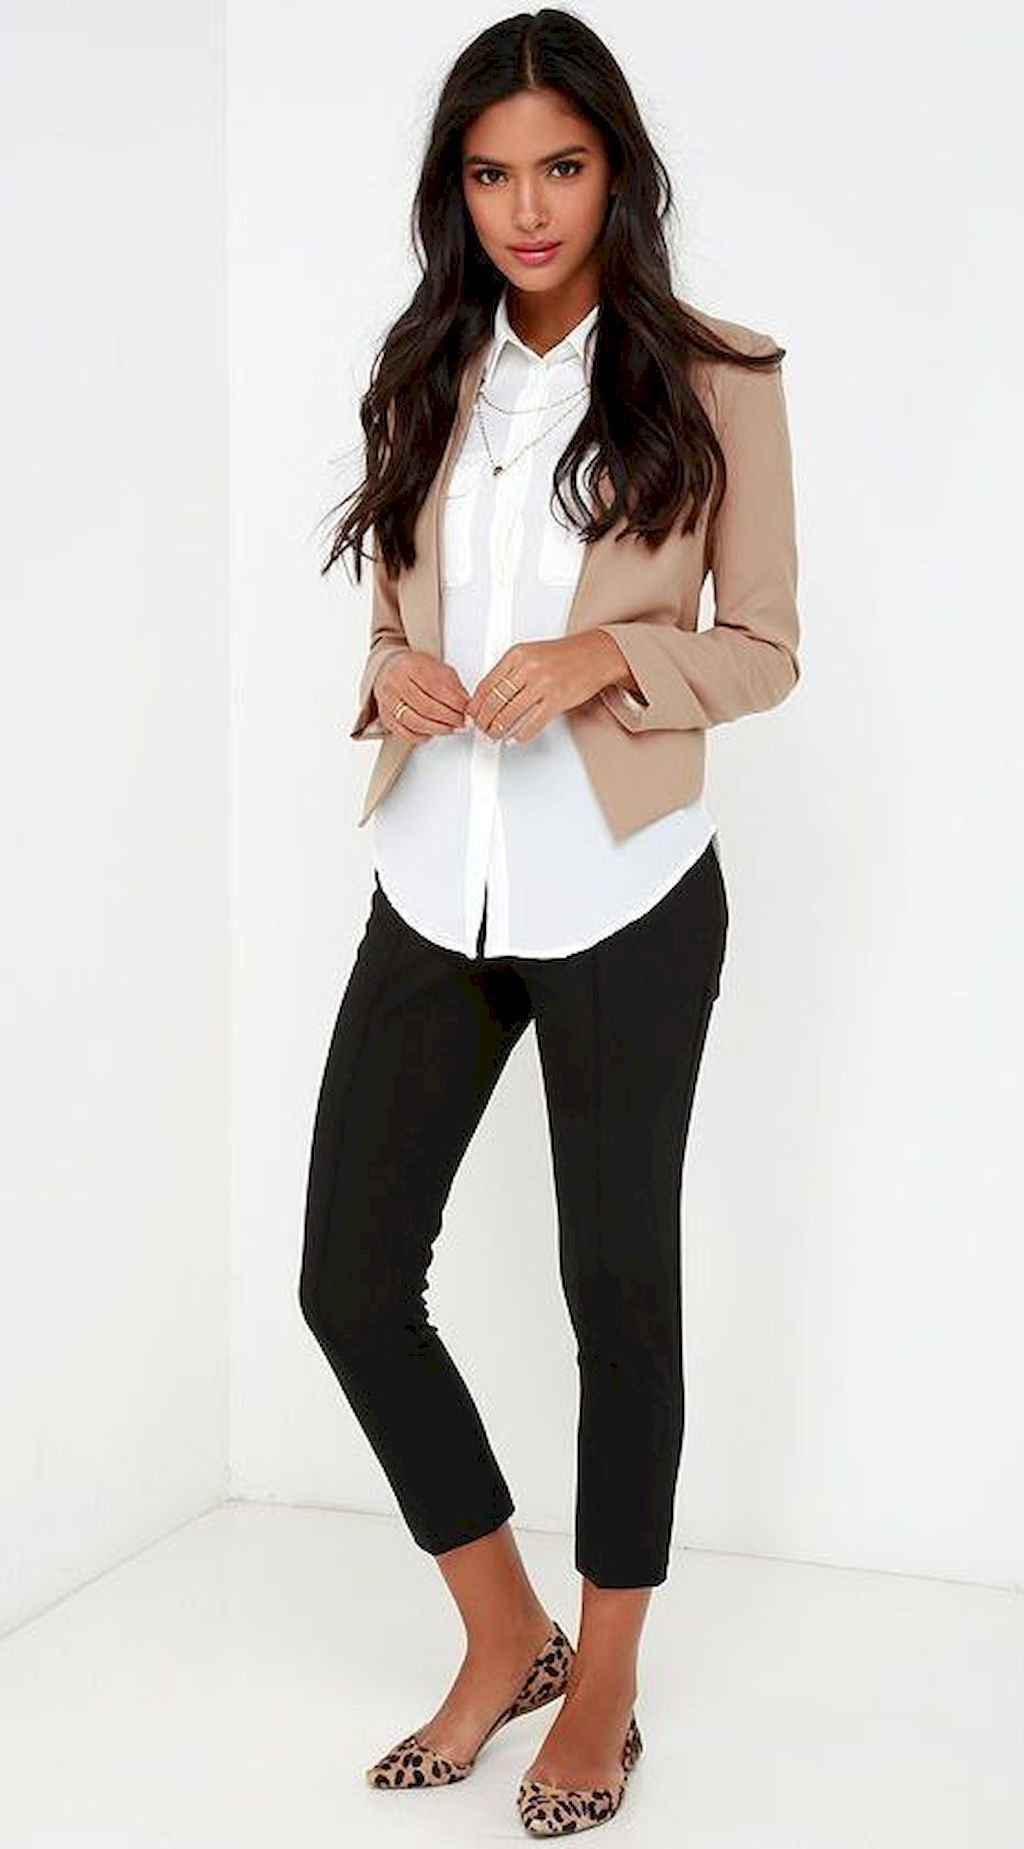 05 best business casual outfit ideas for women bellestilo com